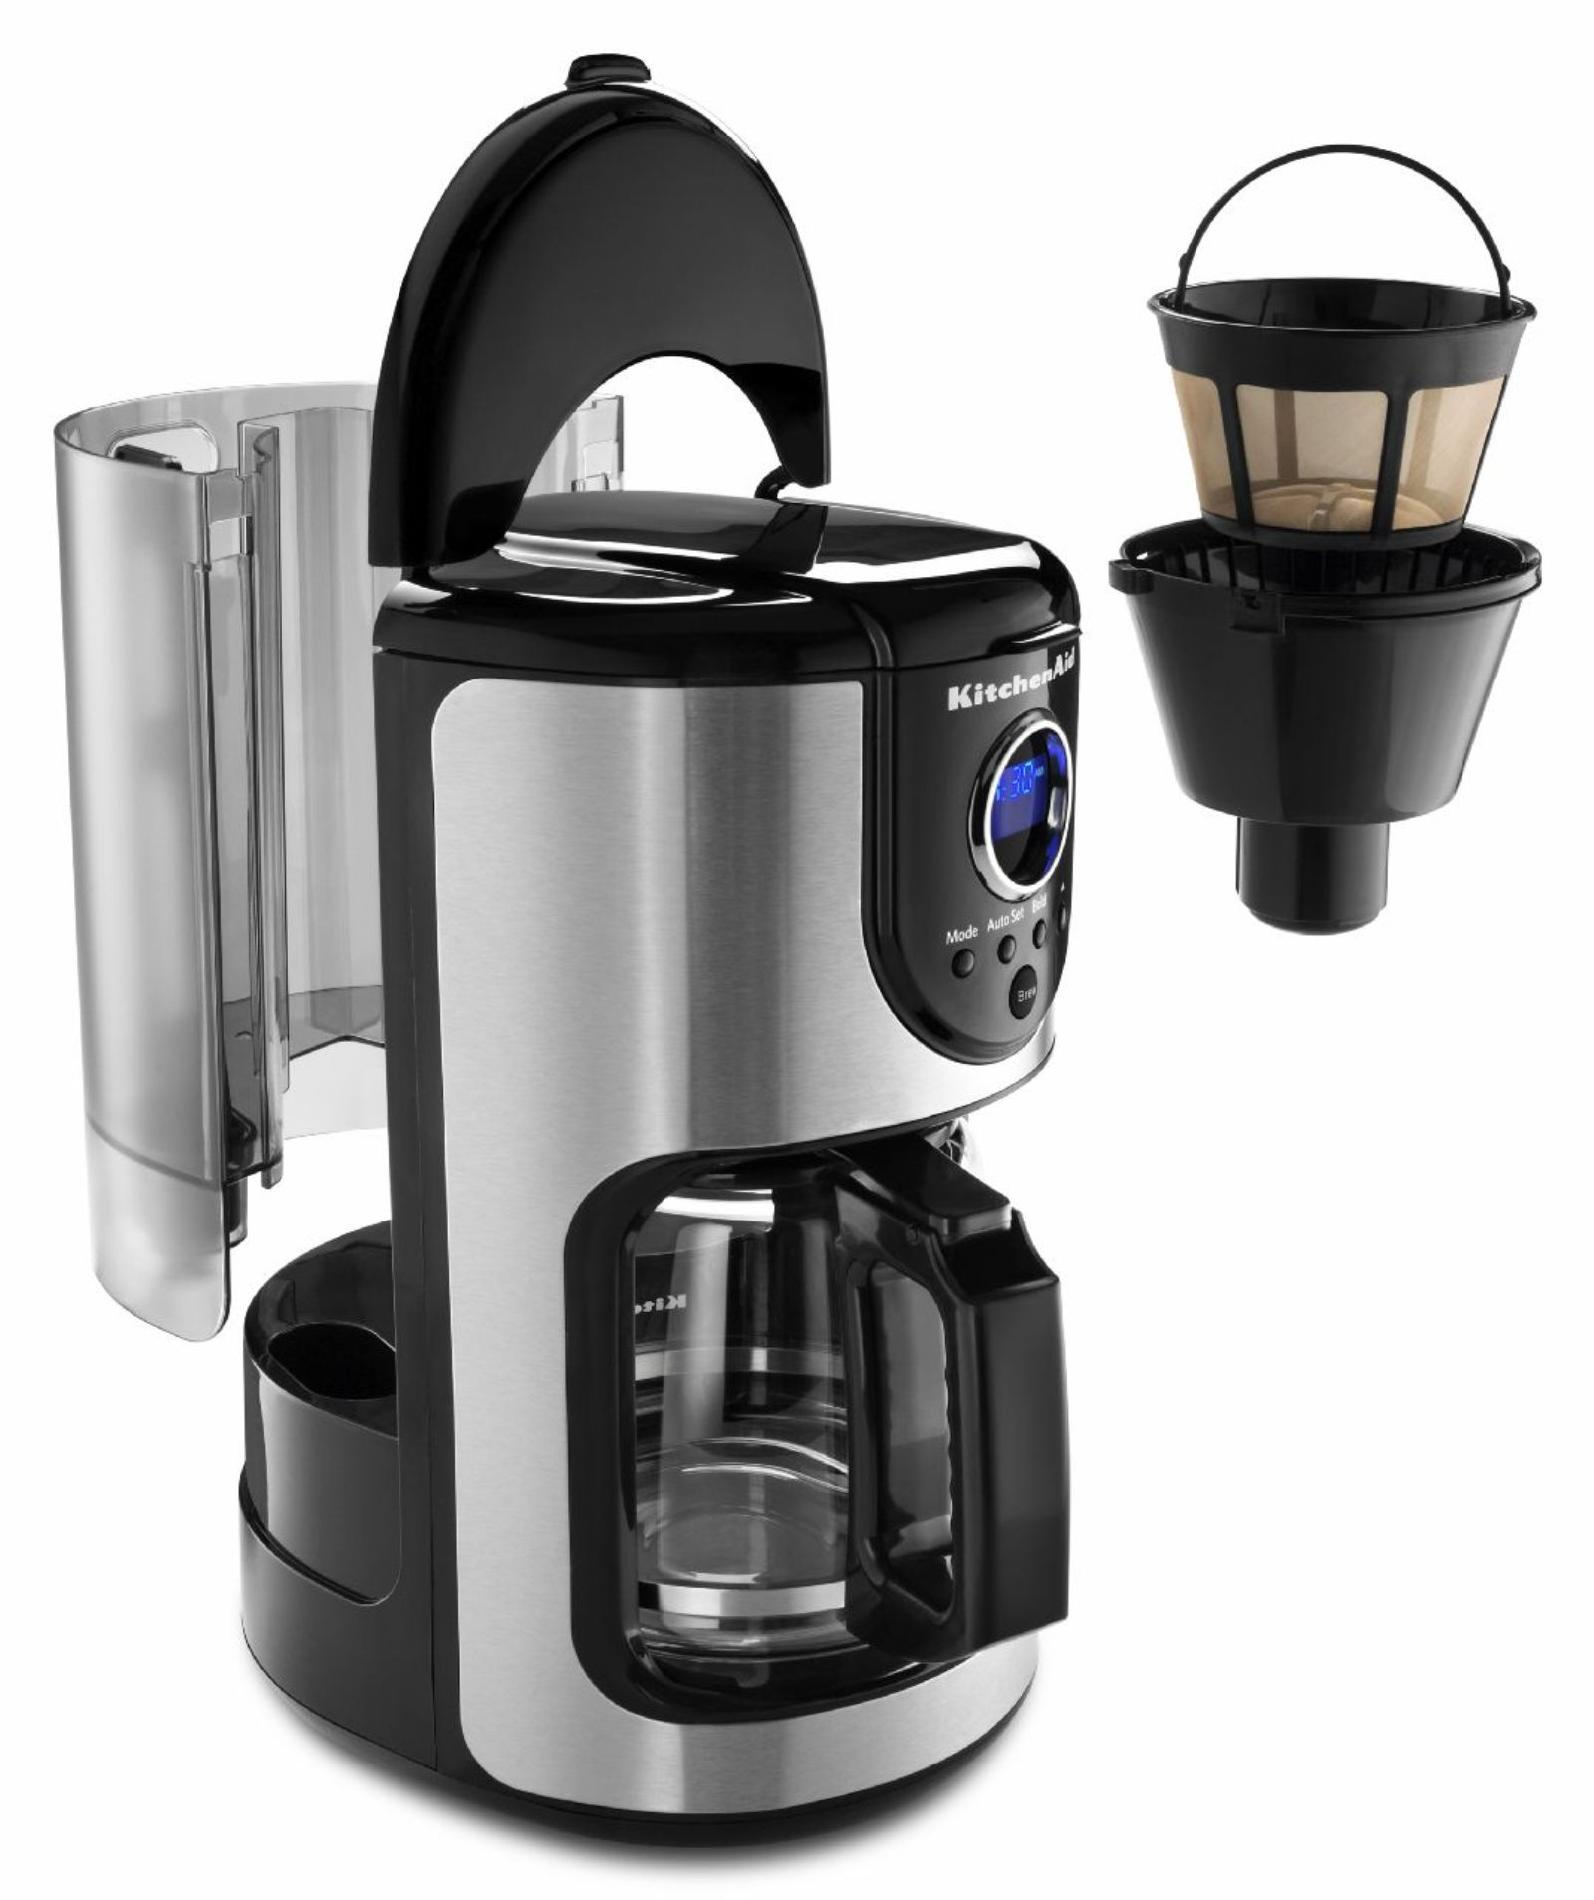 KitchenAid 12-Cup Coffeemaker